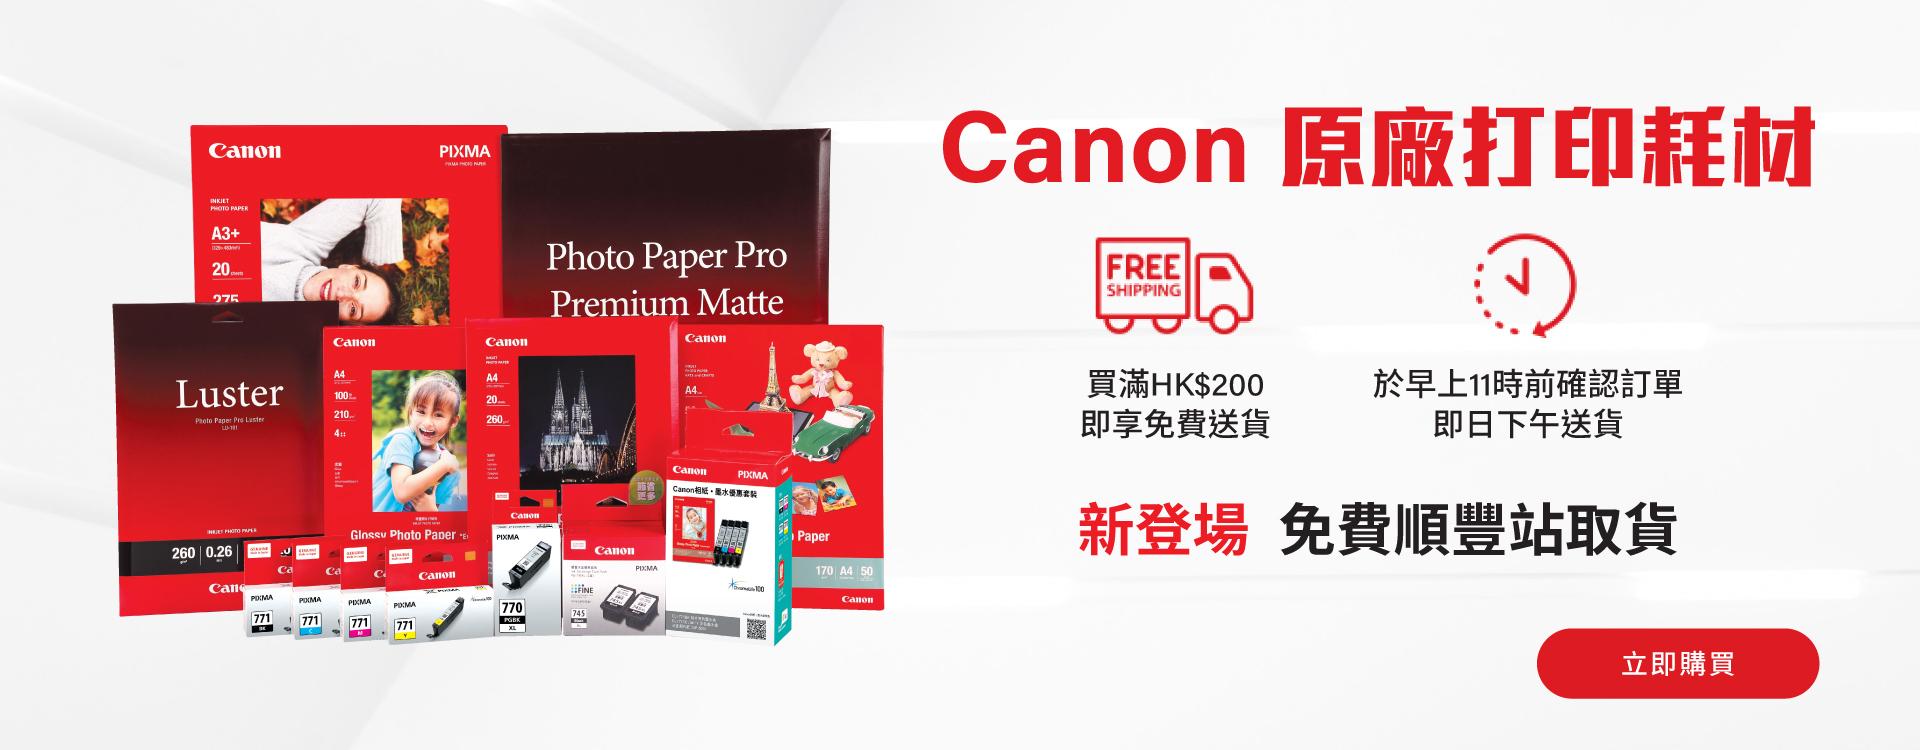 Product List Supplies Canon Hongkong Ink Cartridge Pgi 750xl Black